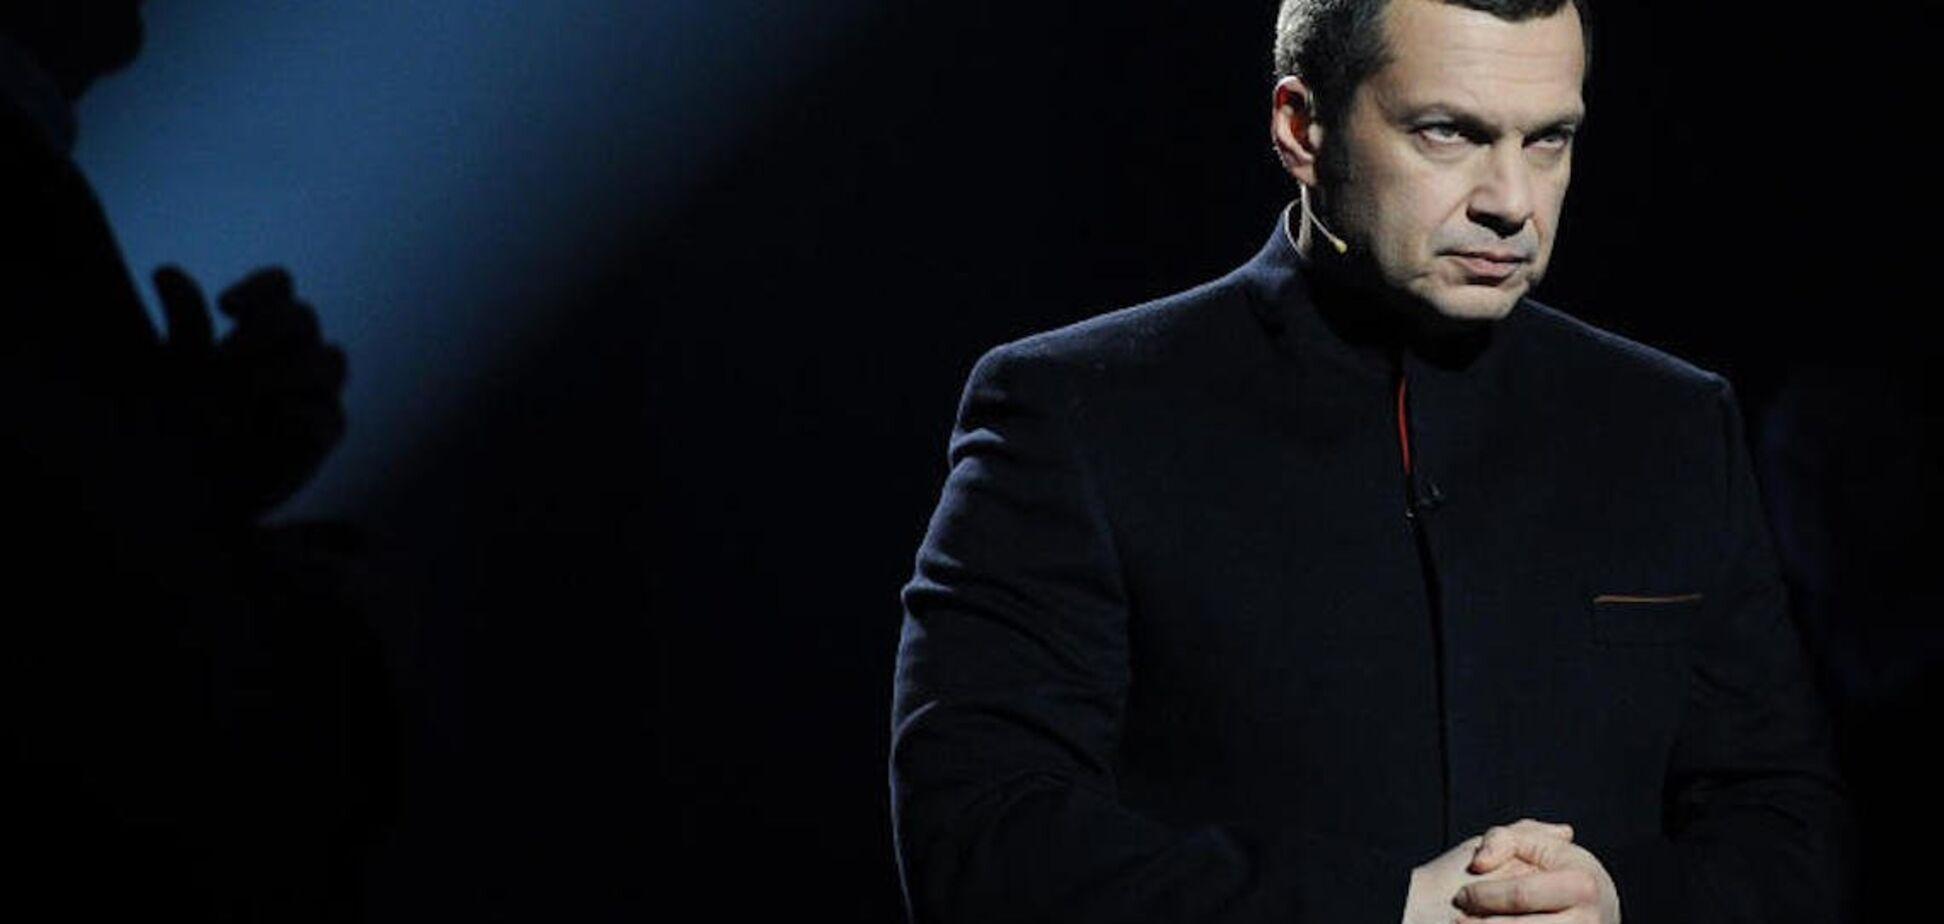 Соловйов попросить повернути Україні Крим: пропагандисту Кремля передрекли долю